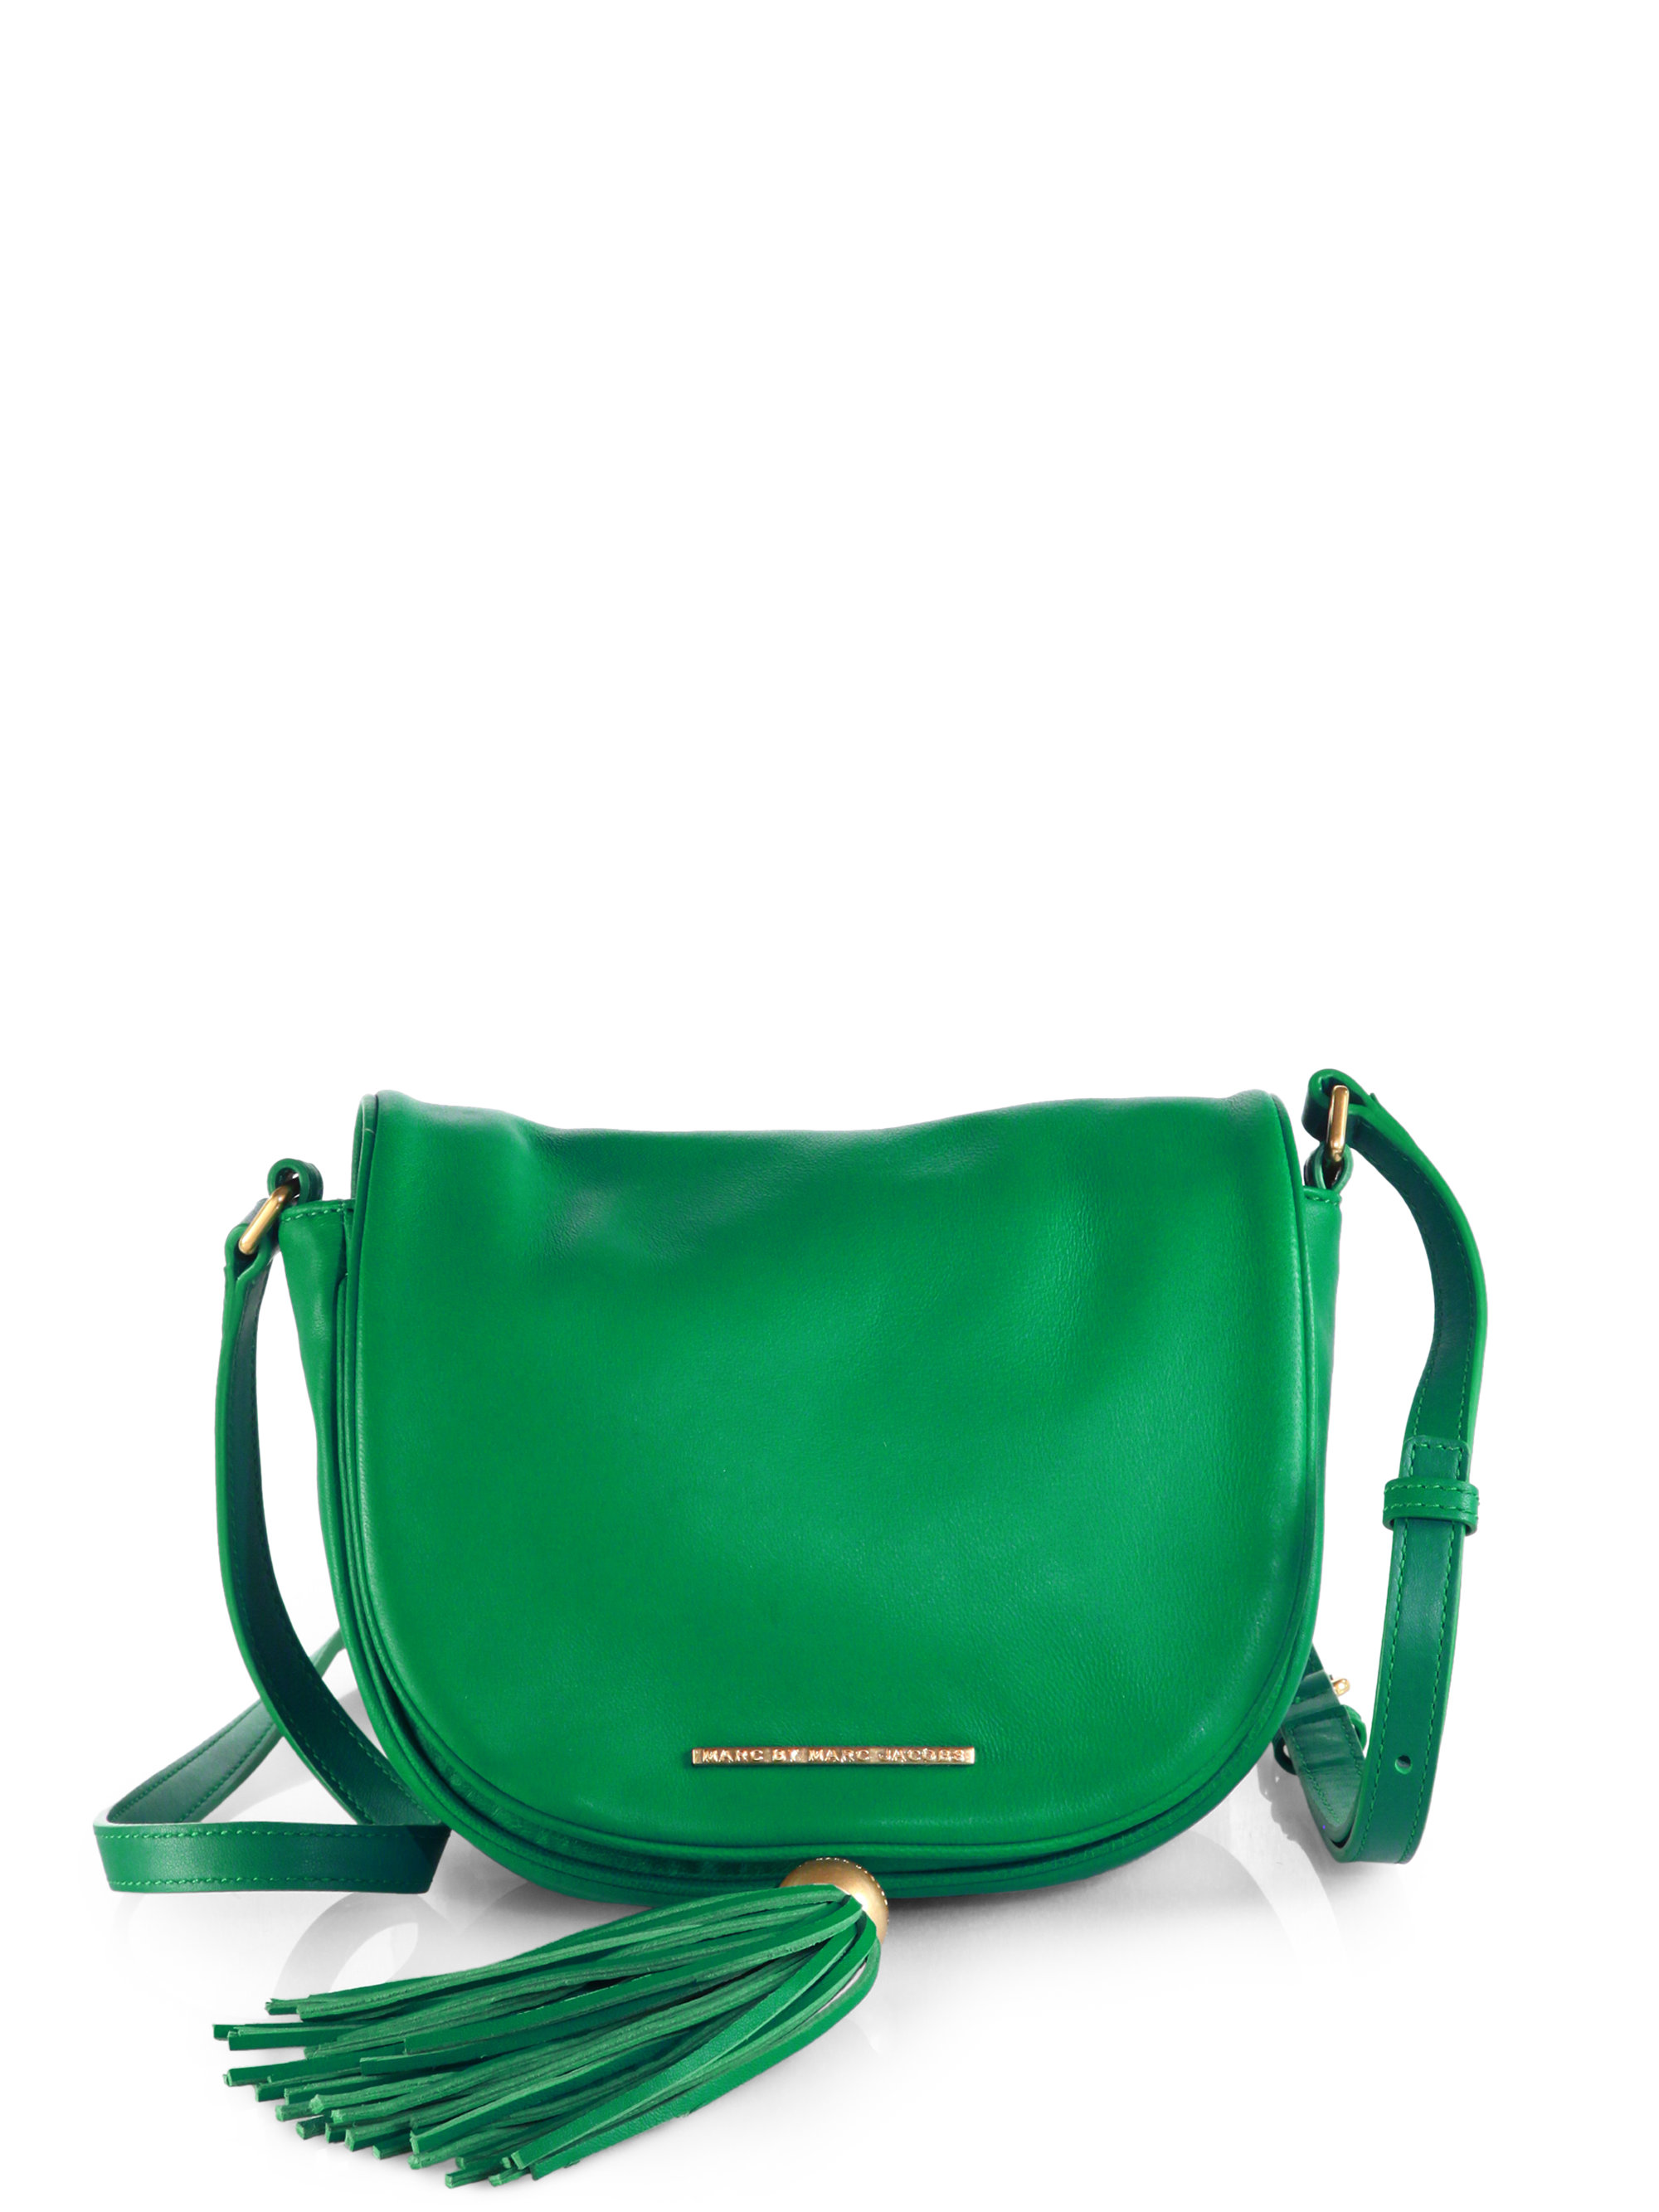 054220fc5de9 Lyst - Marc By Marc Jacobs Gig Hincy Crossbody Bag in Green